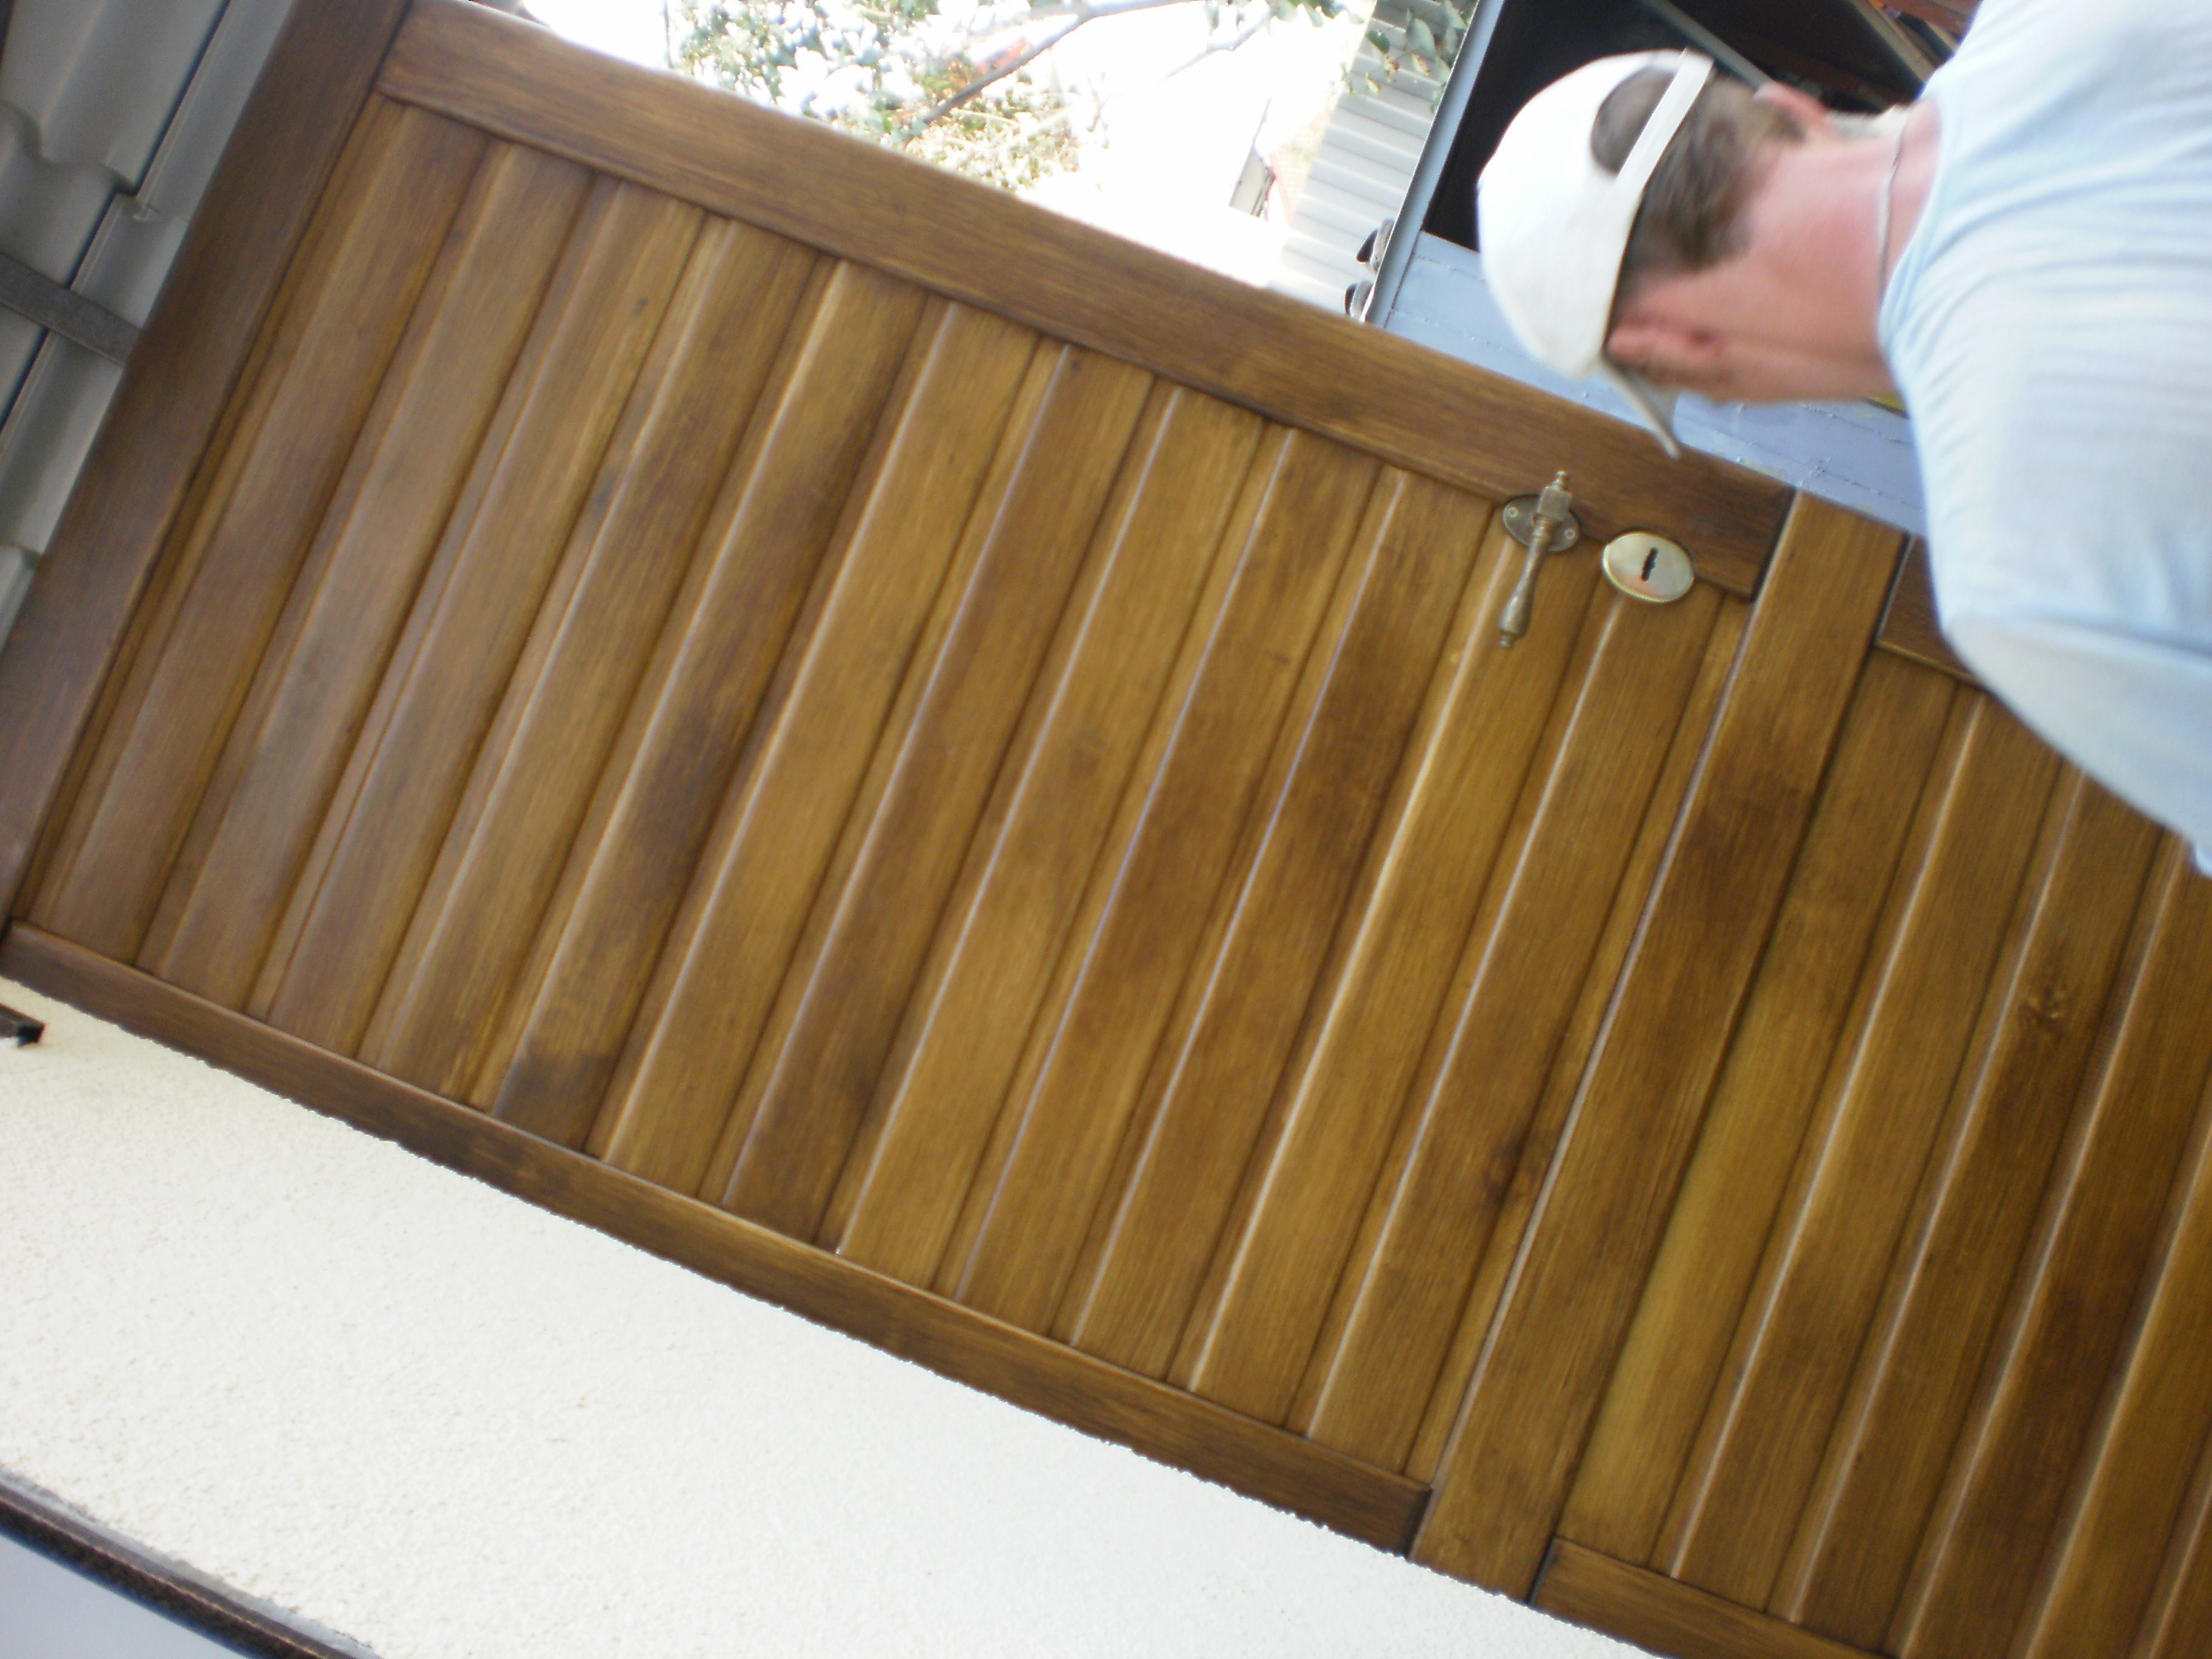 Обшивка двери вагонкой своими руками: фото и видео